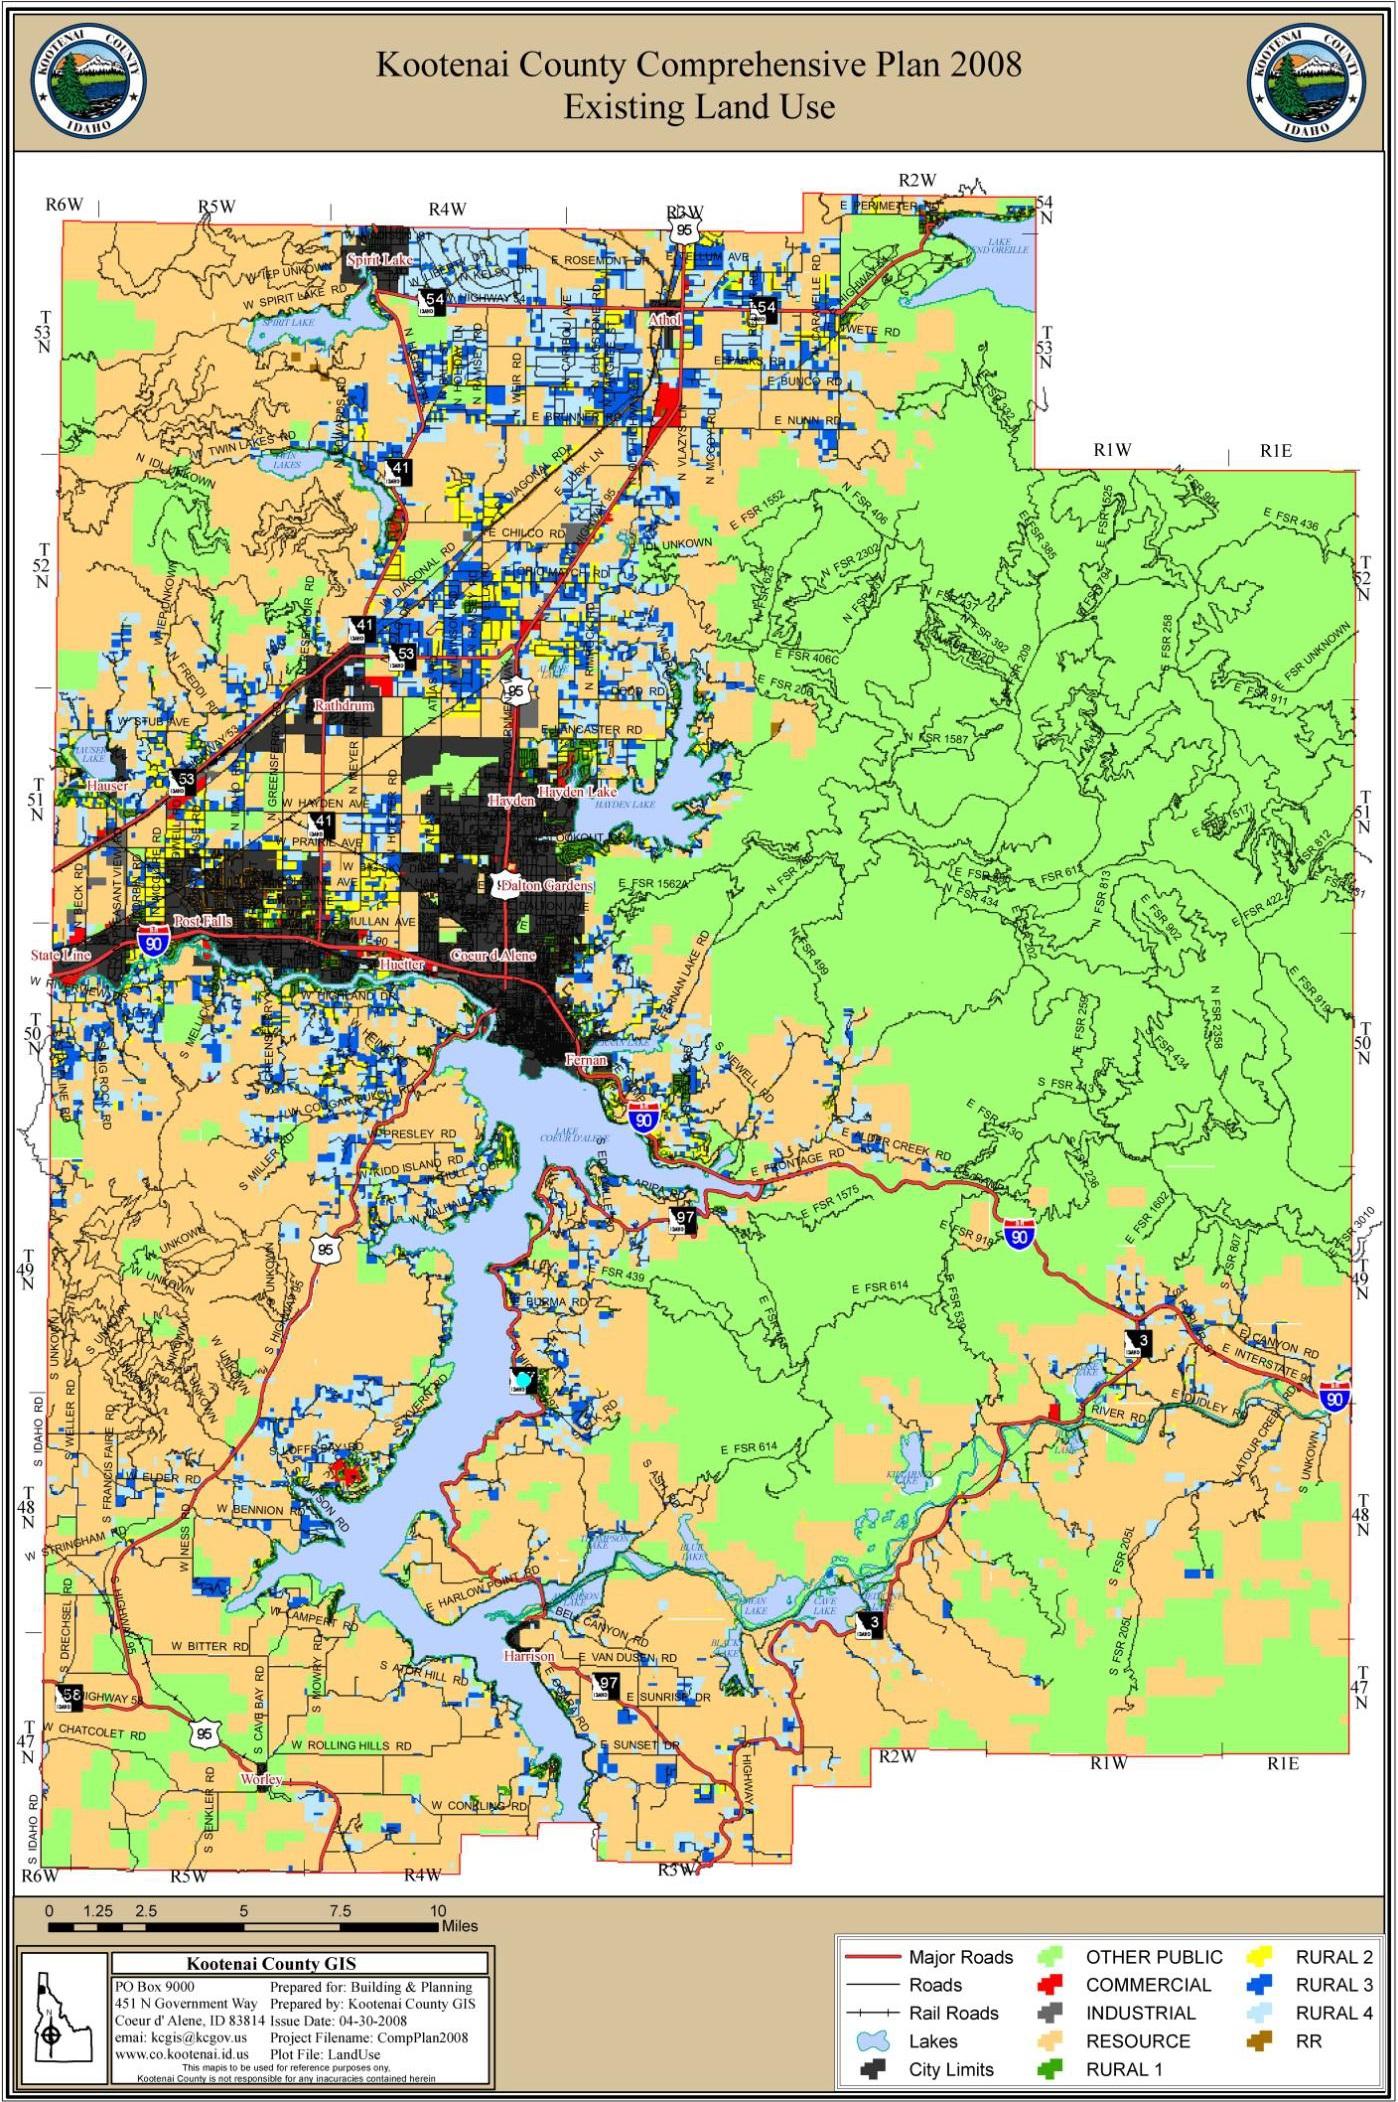 Kootenai County Land use map